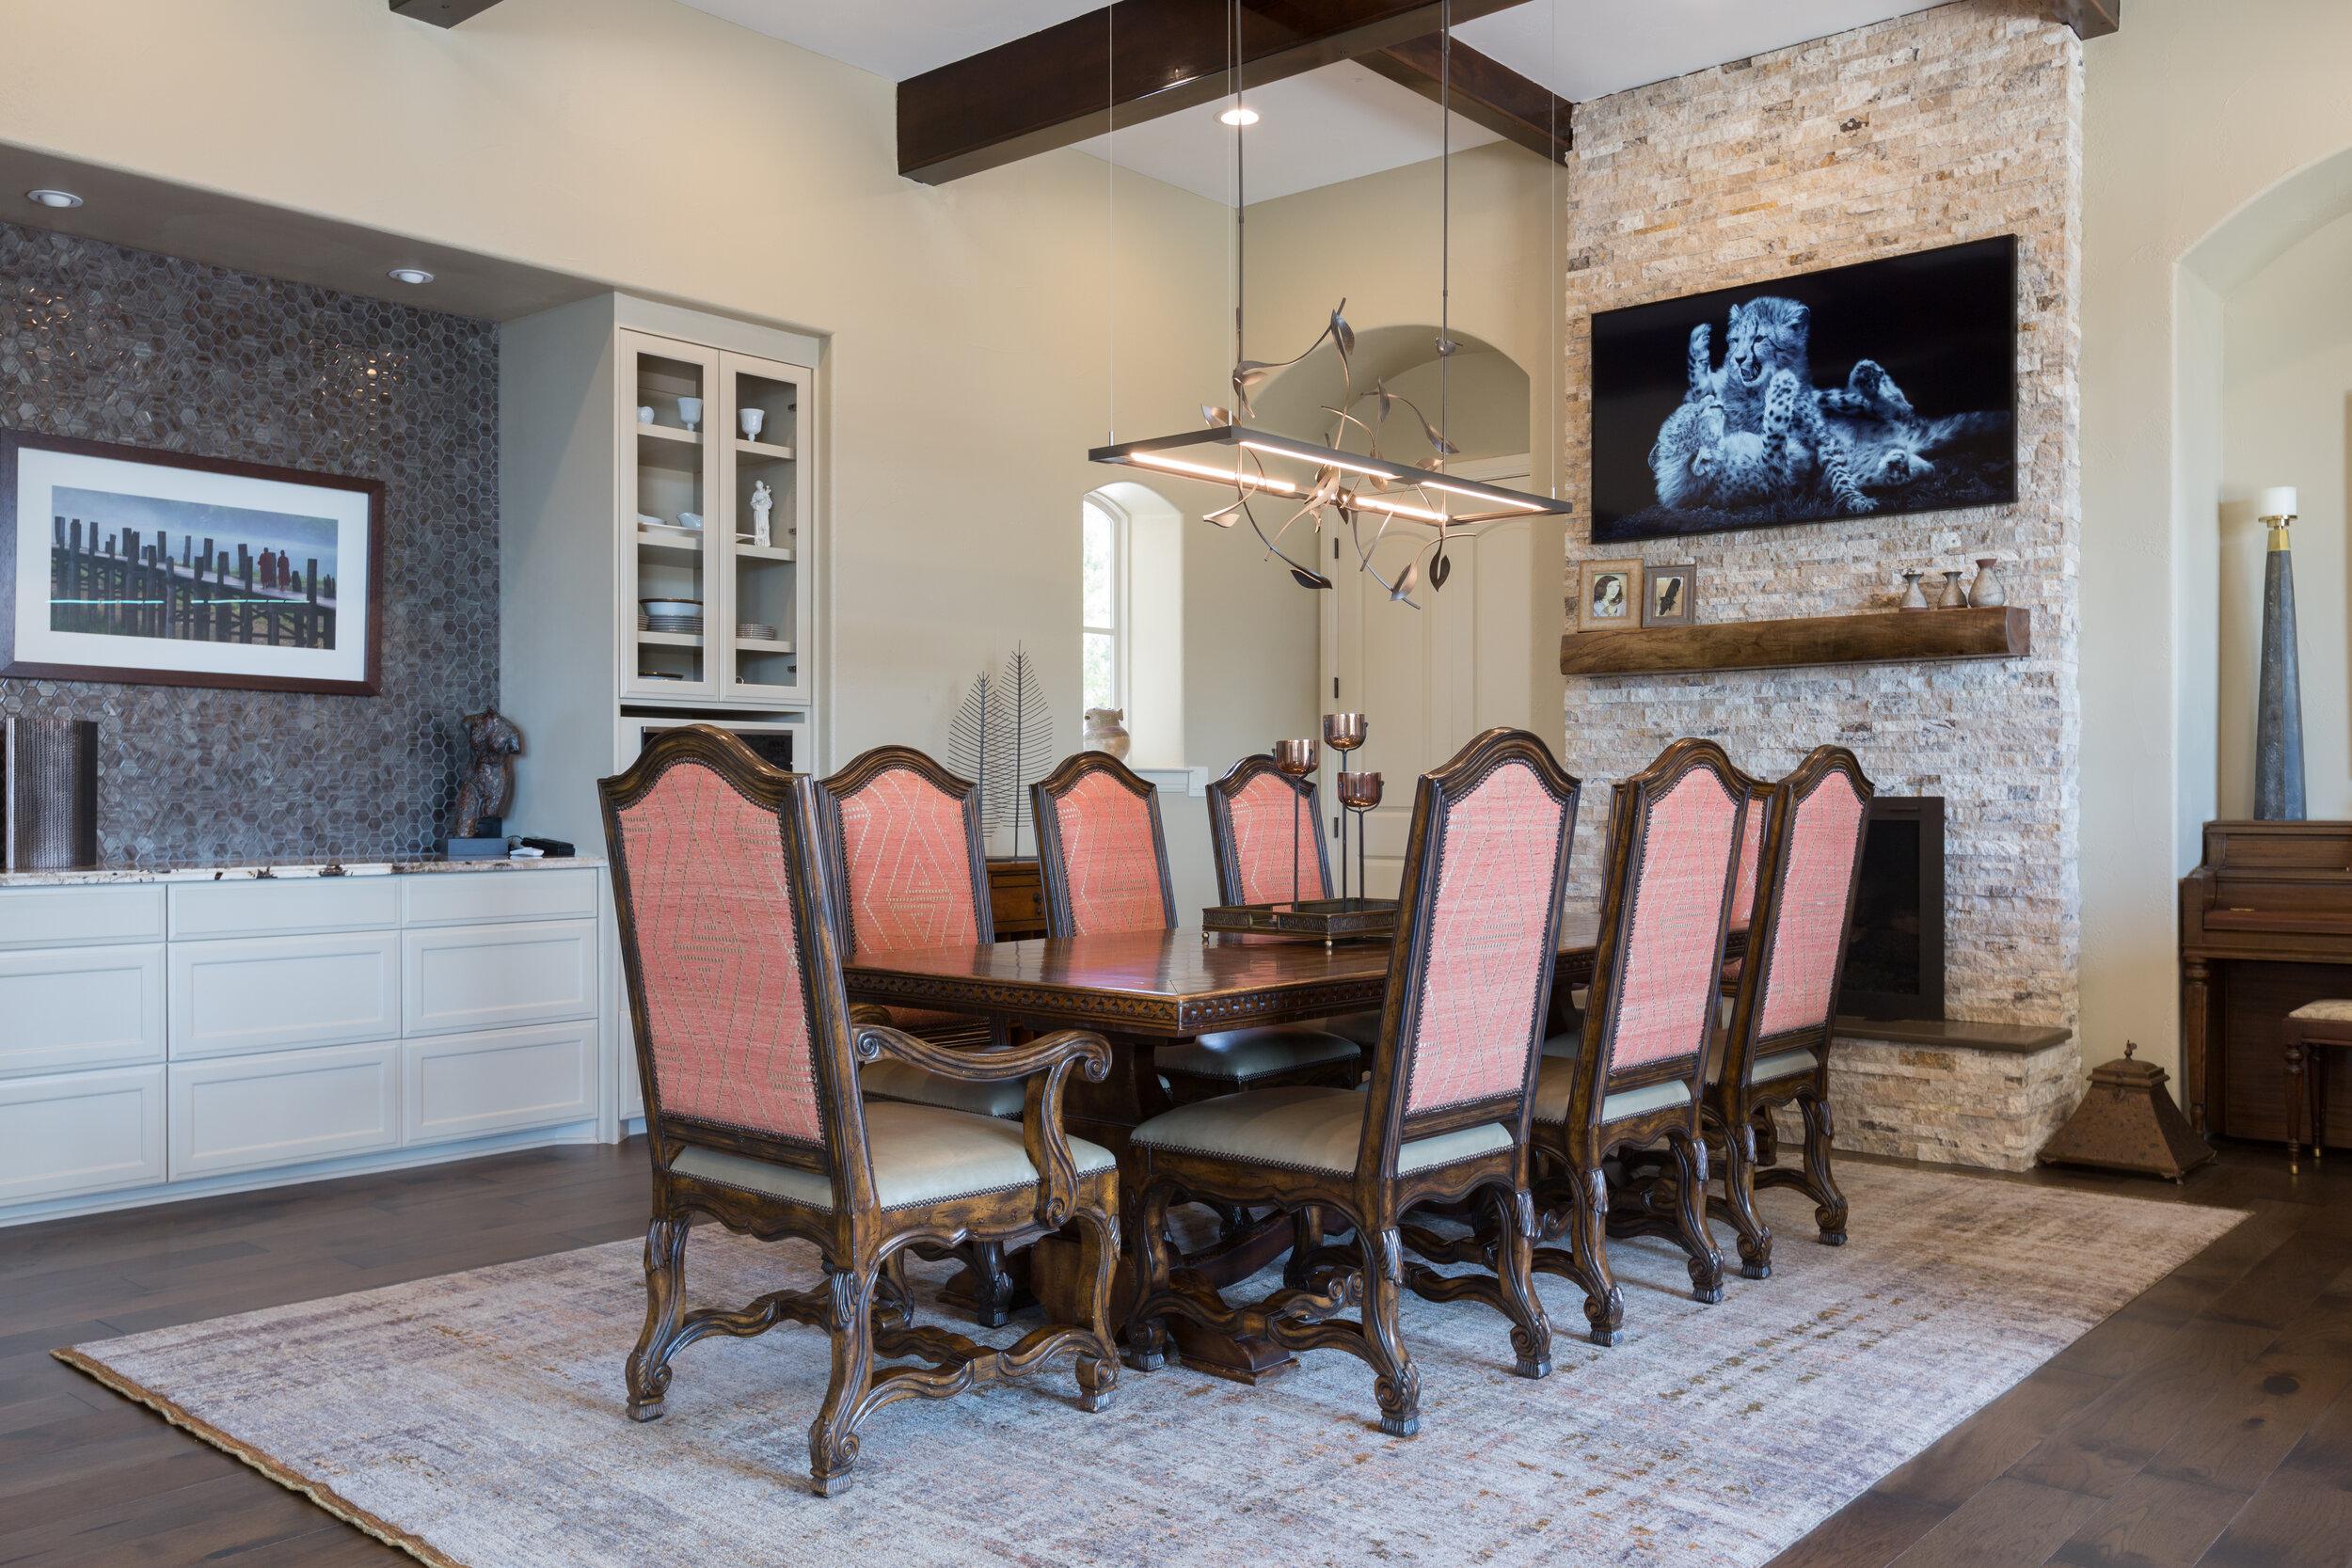 diningroomwithcustomchairs.jpg